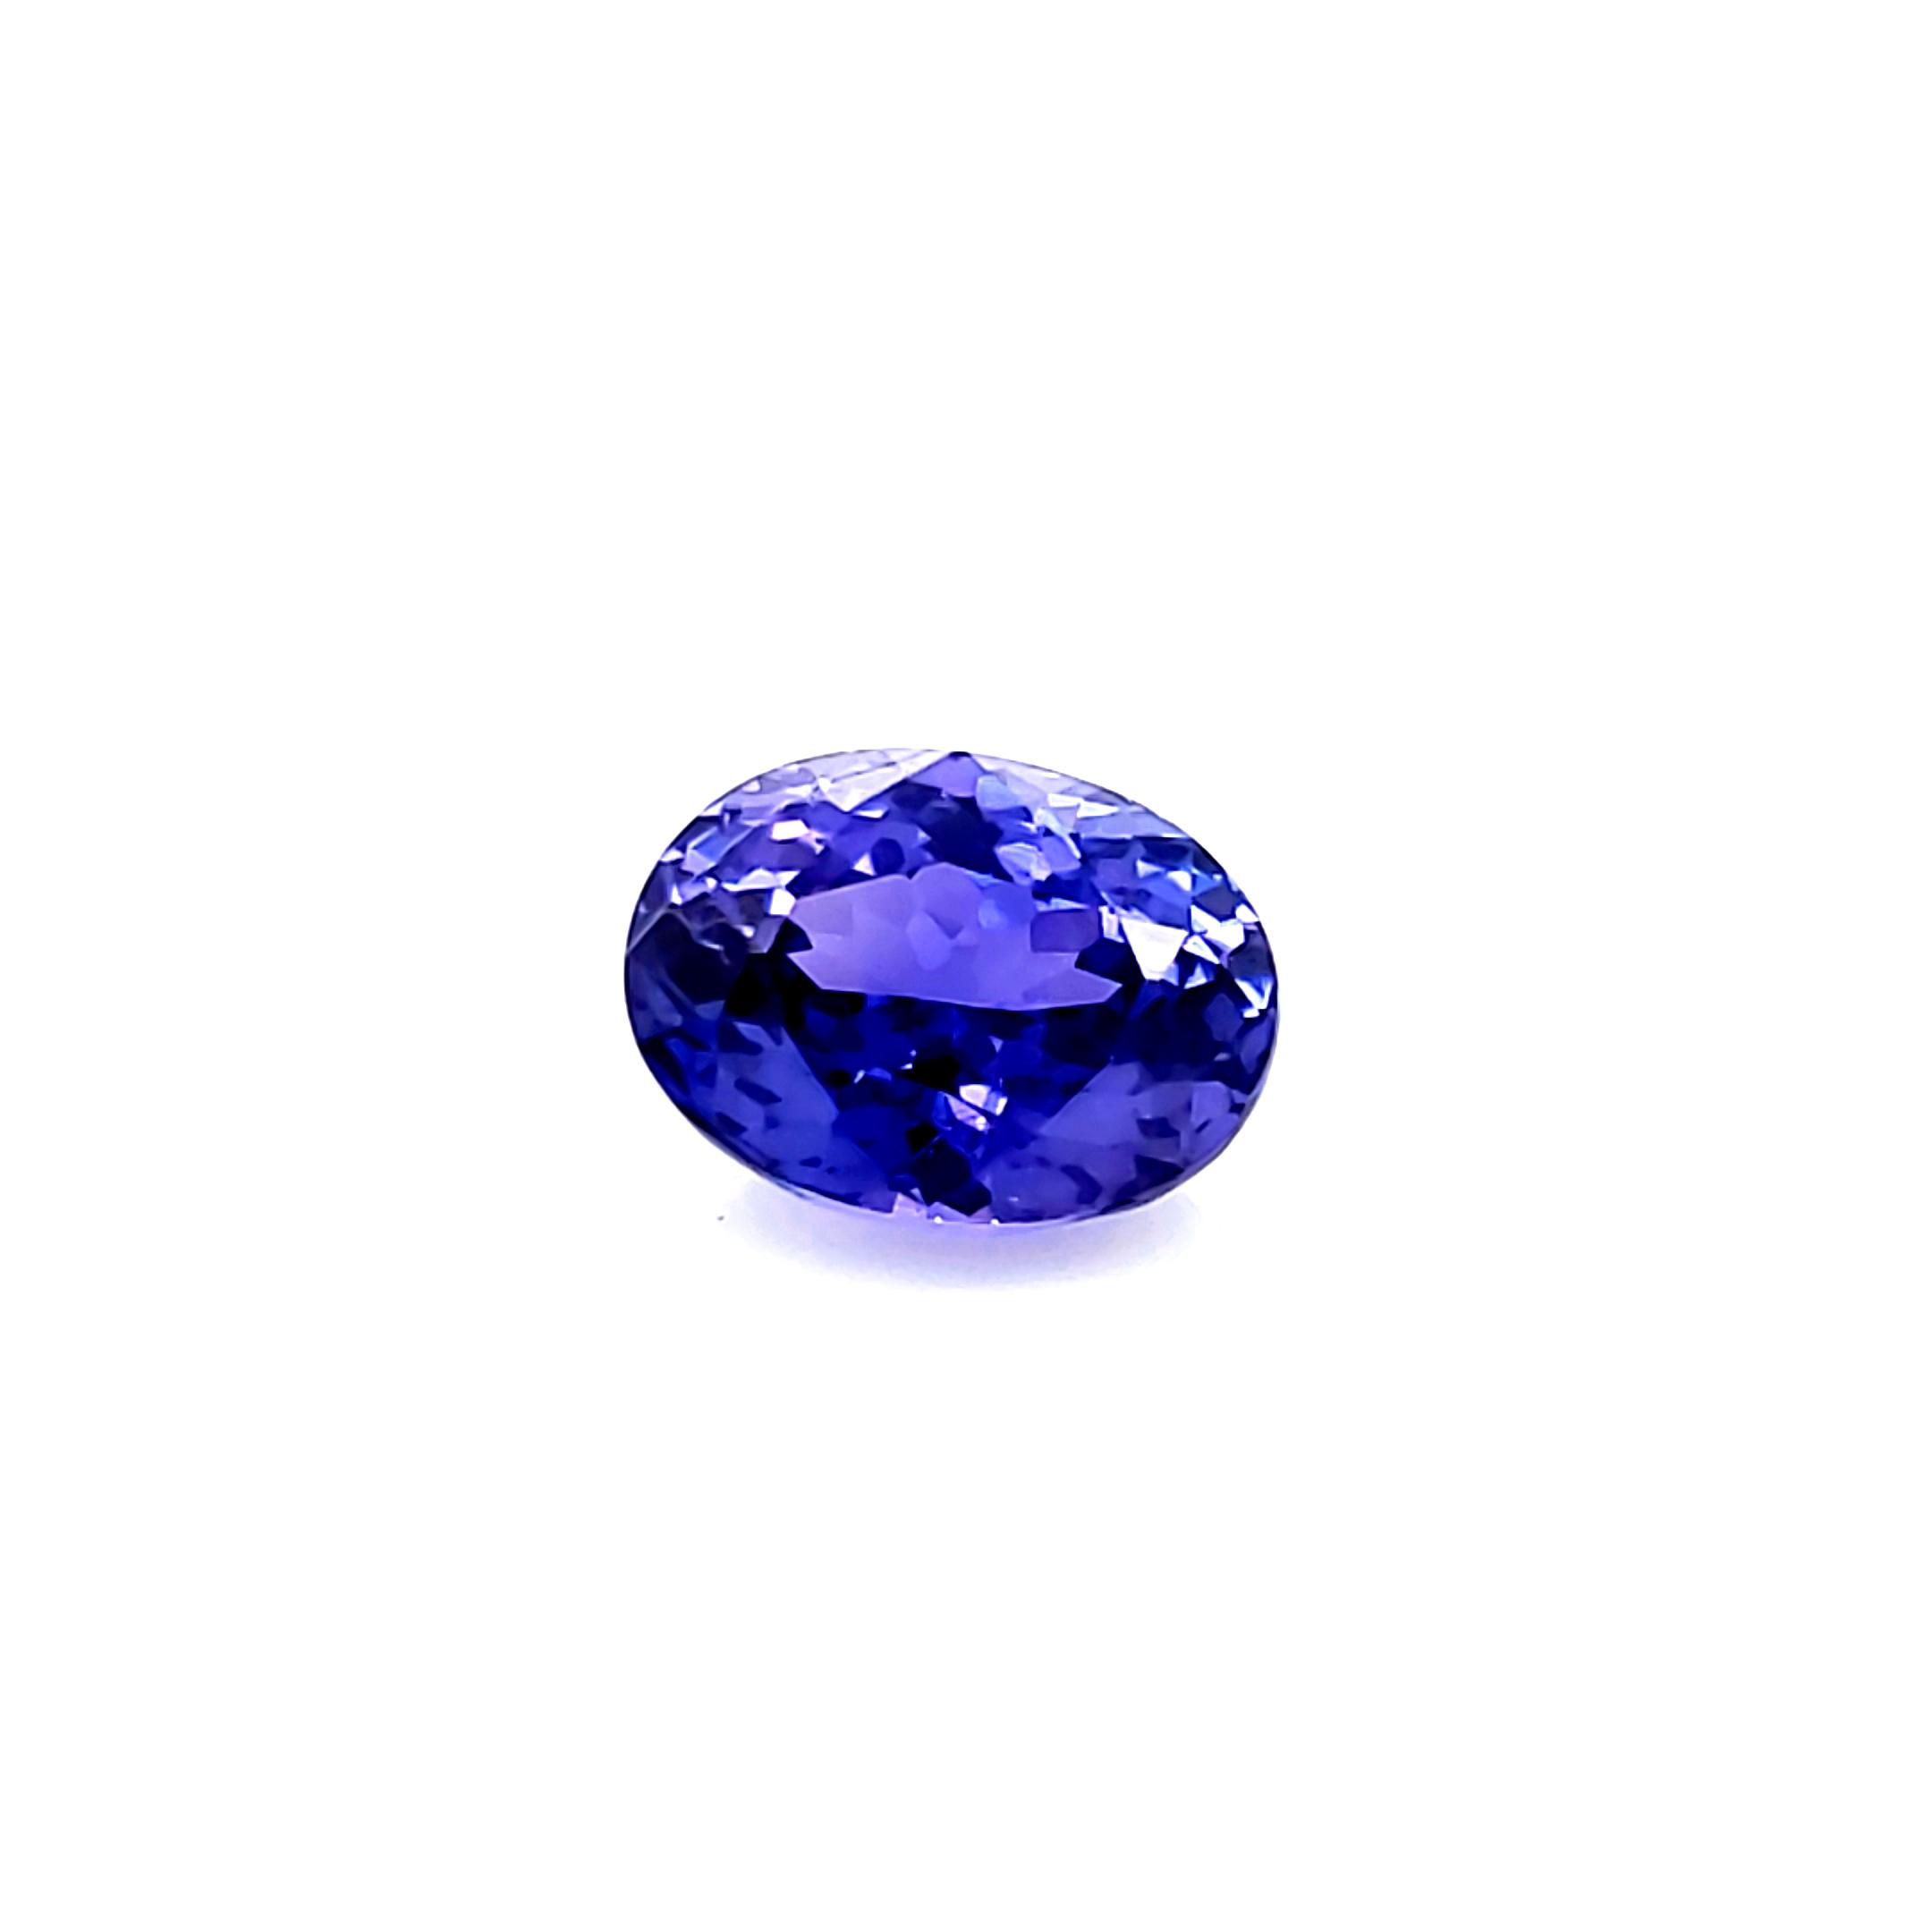 1.8 ct. Color Change Sapphire